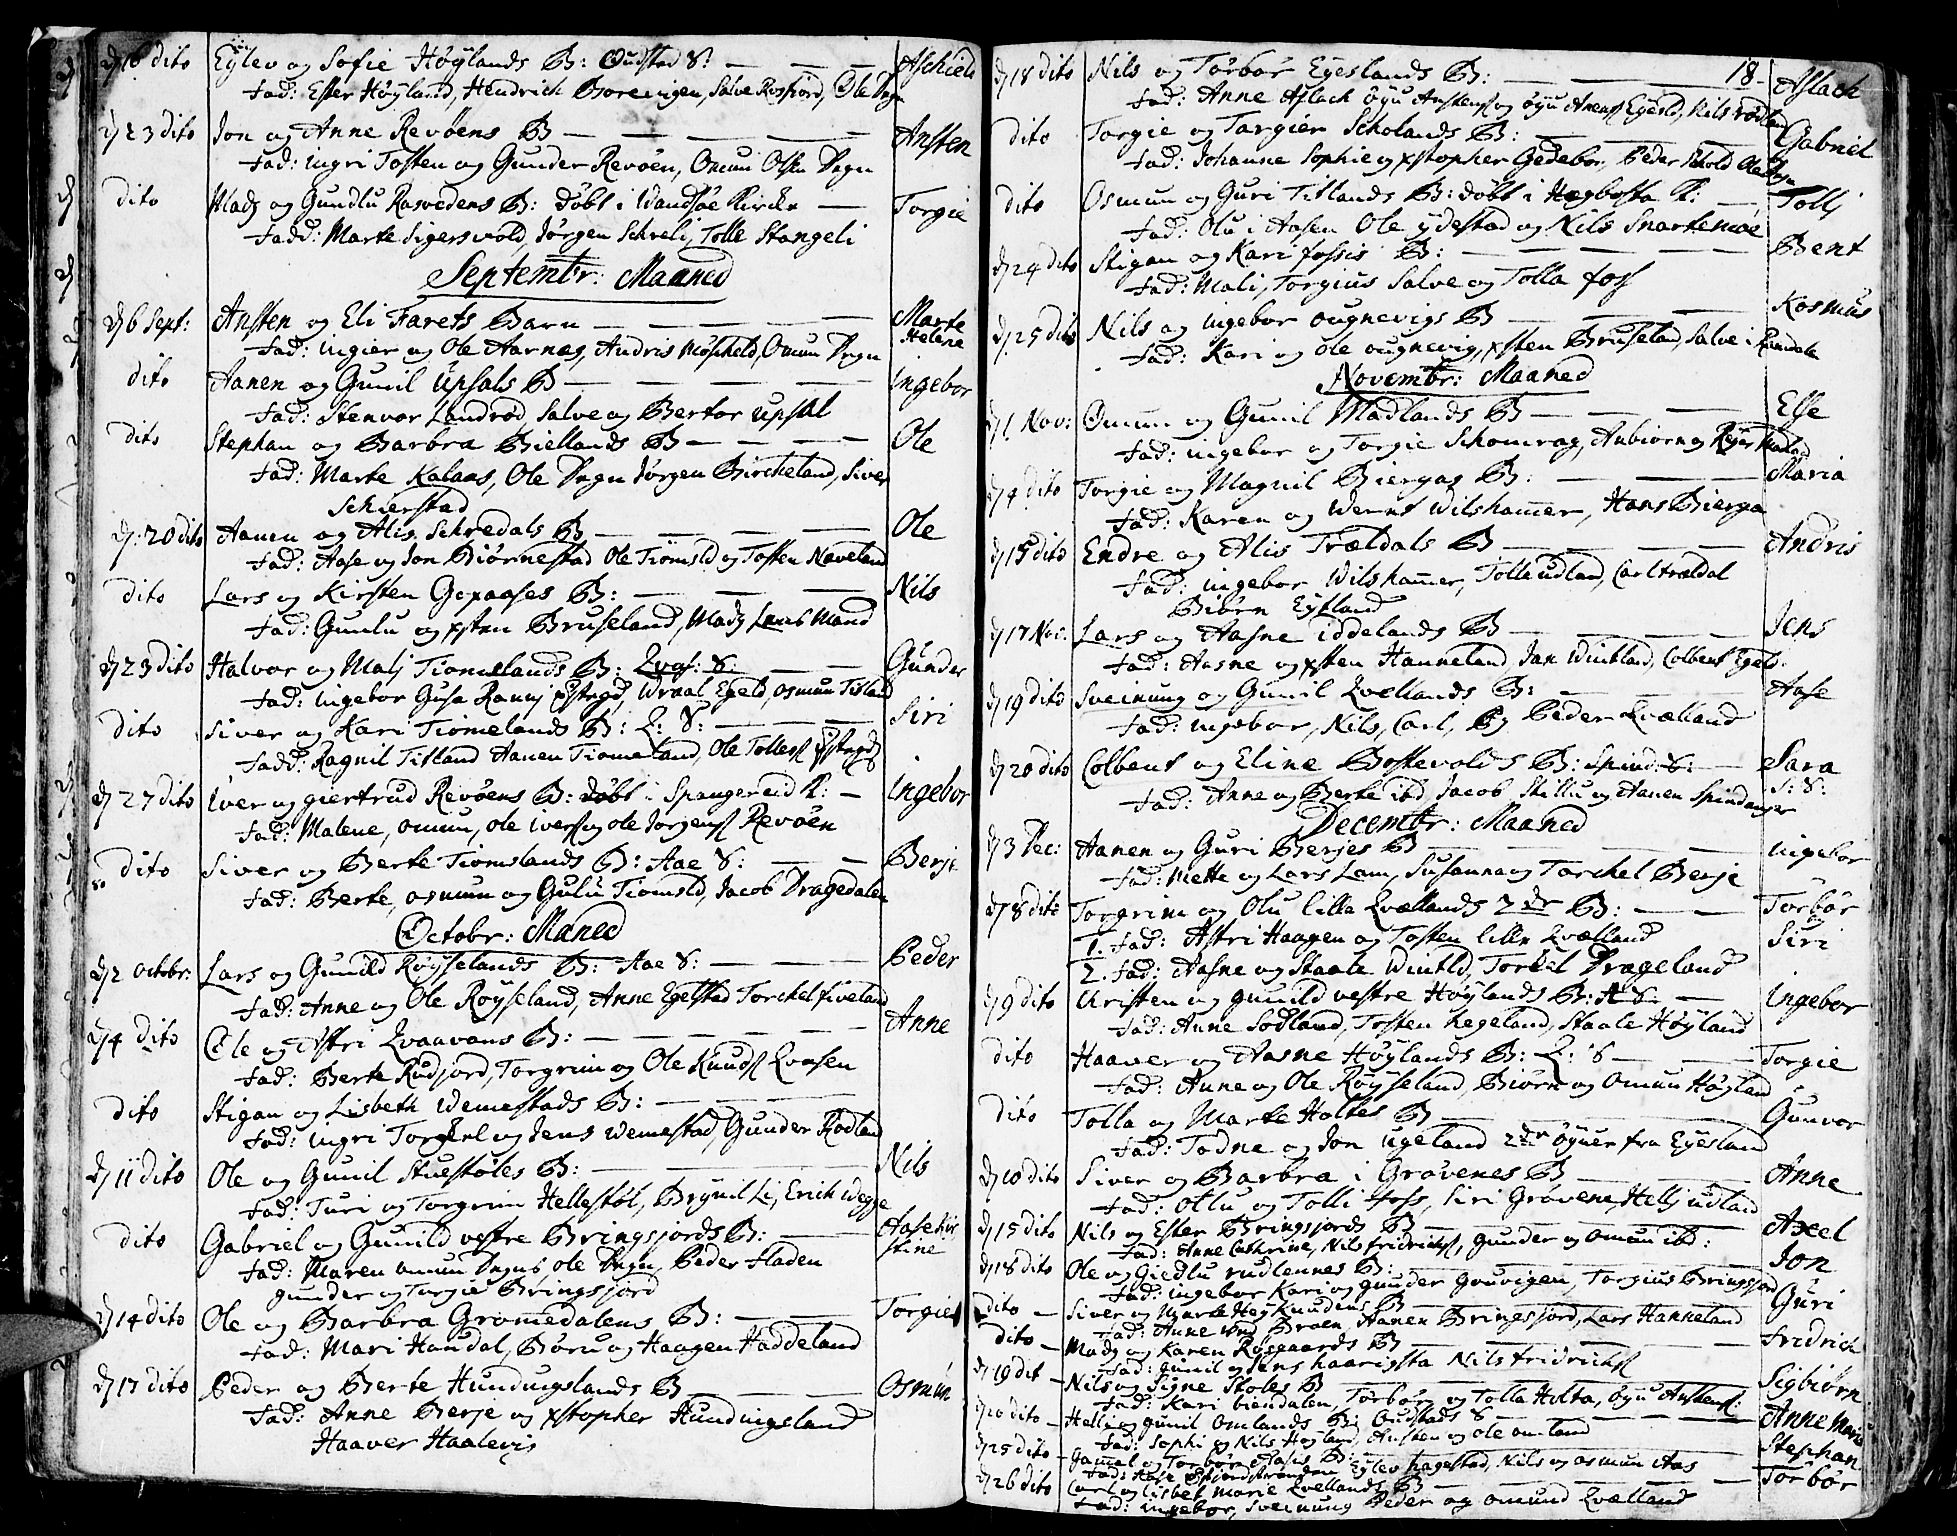 SAK, Lyngdal sokneprestkontor, F/Fa/Fac/L0001: Ministerialbok nr. A 1, 1727-1779, s. 18